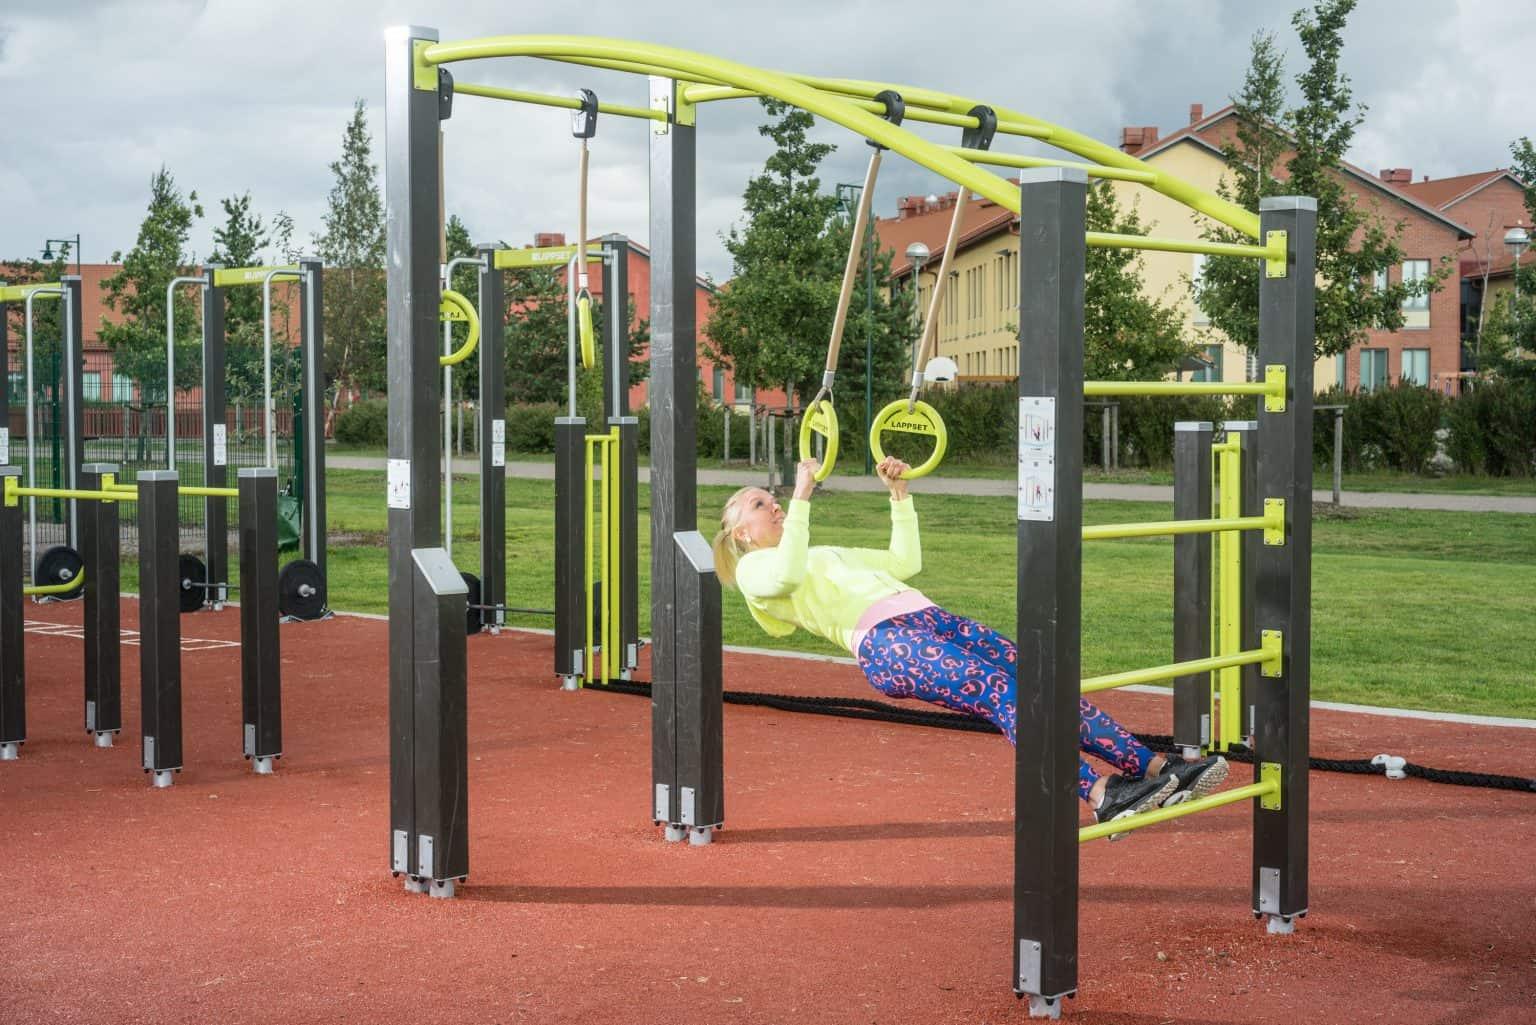 outdoor-fitness-equipment_49643807551_o-1536x1025